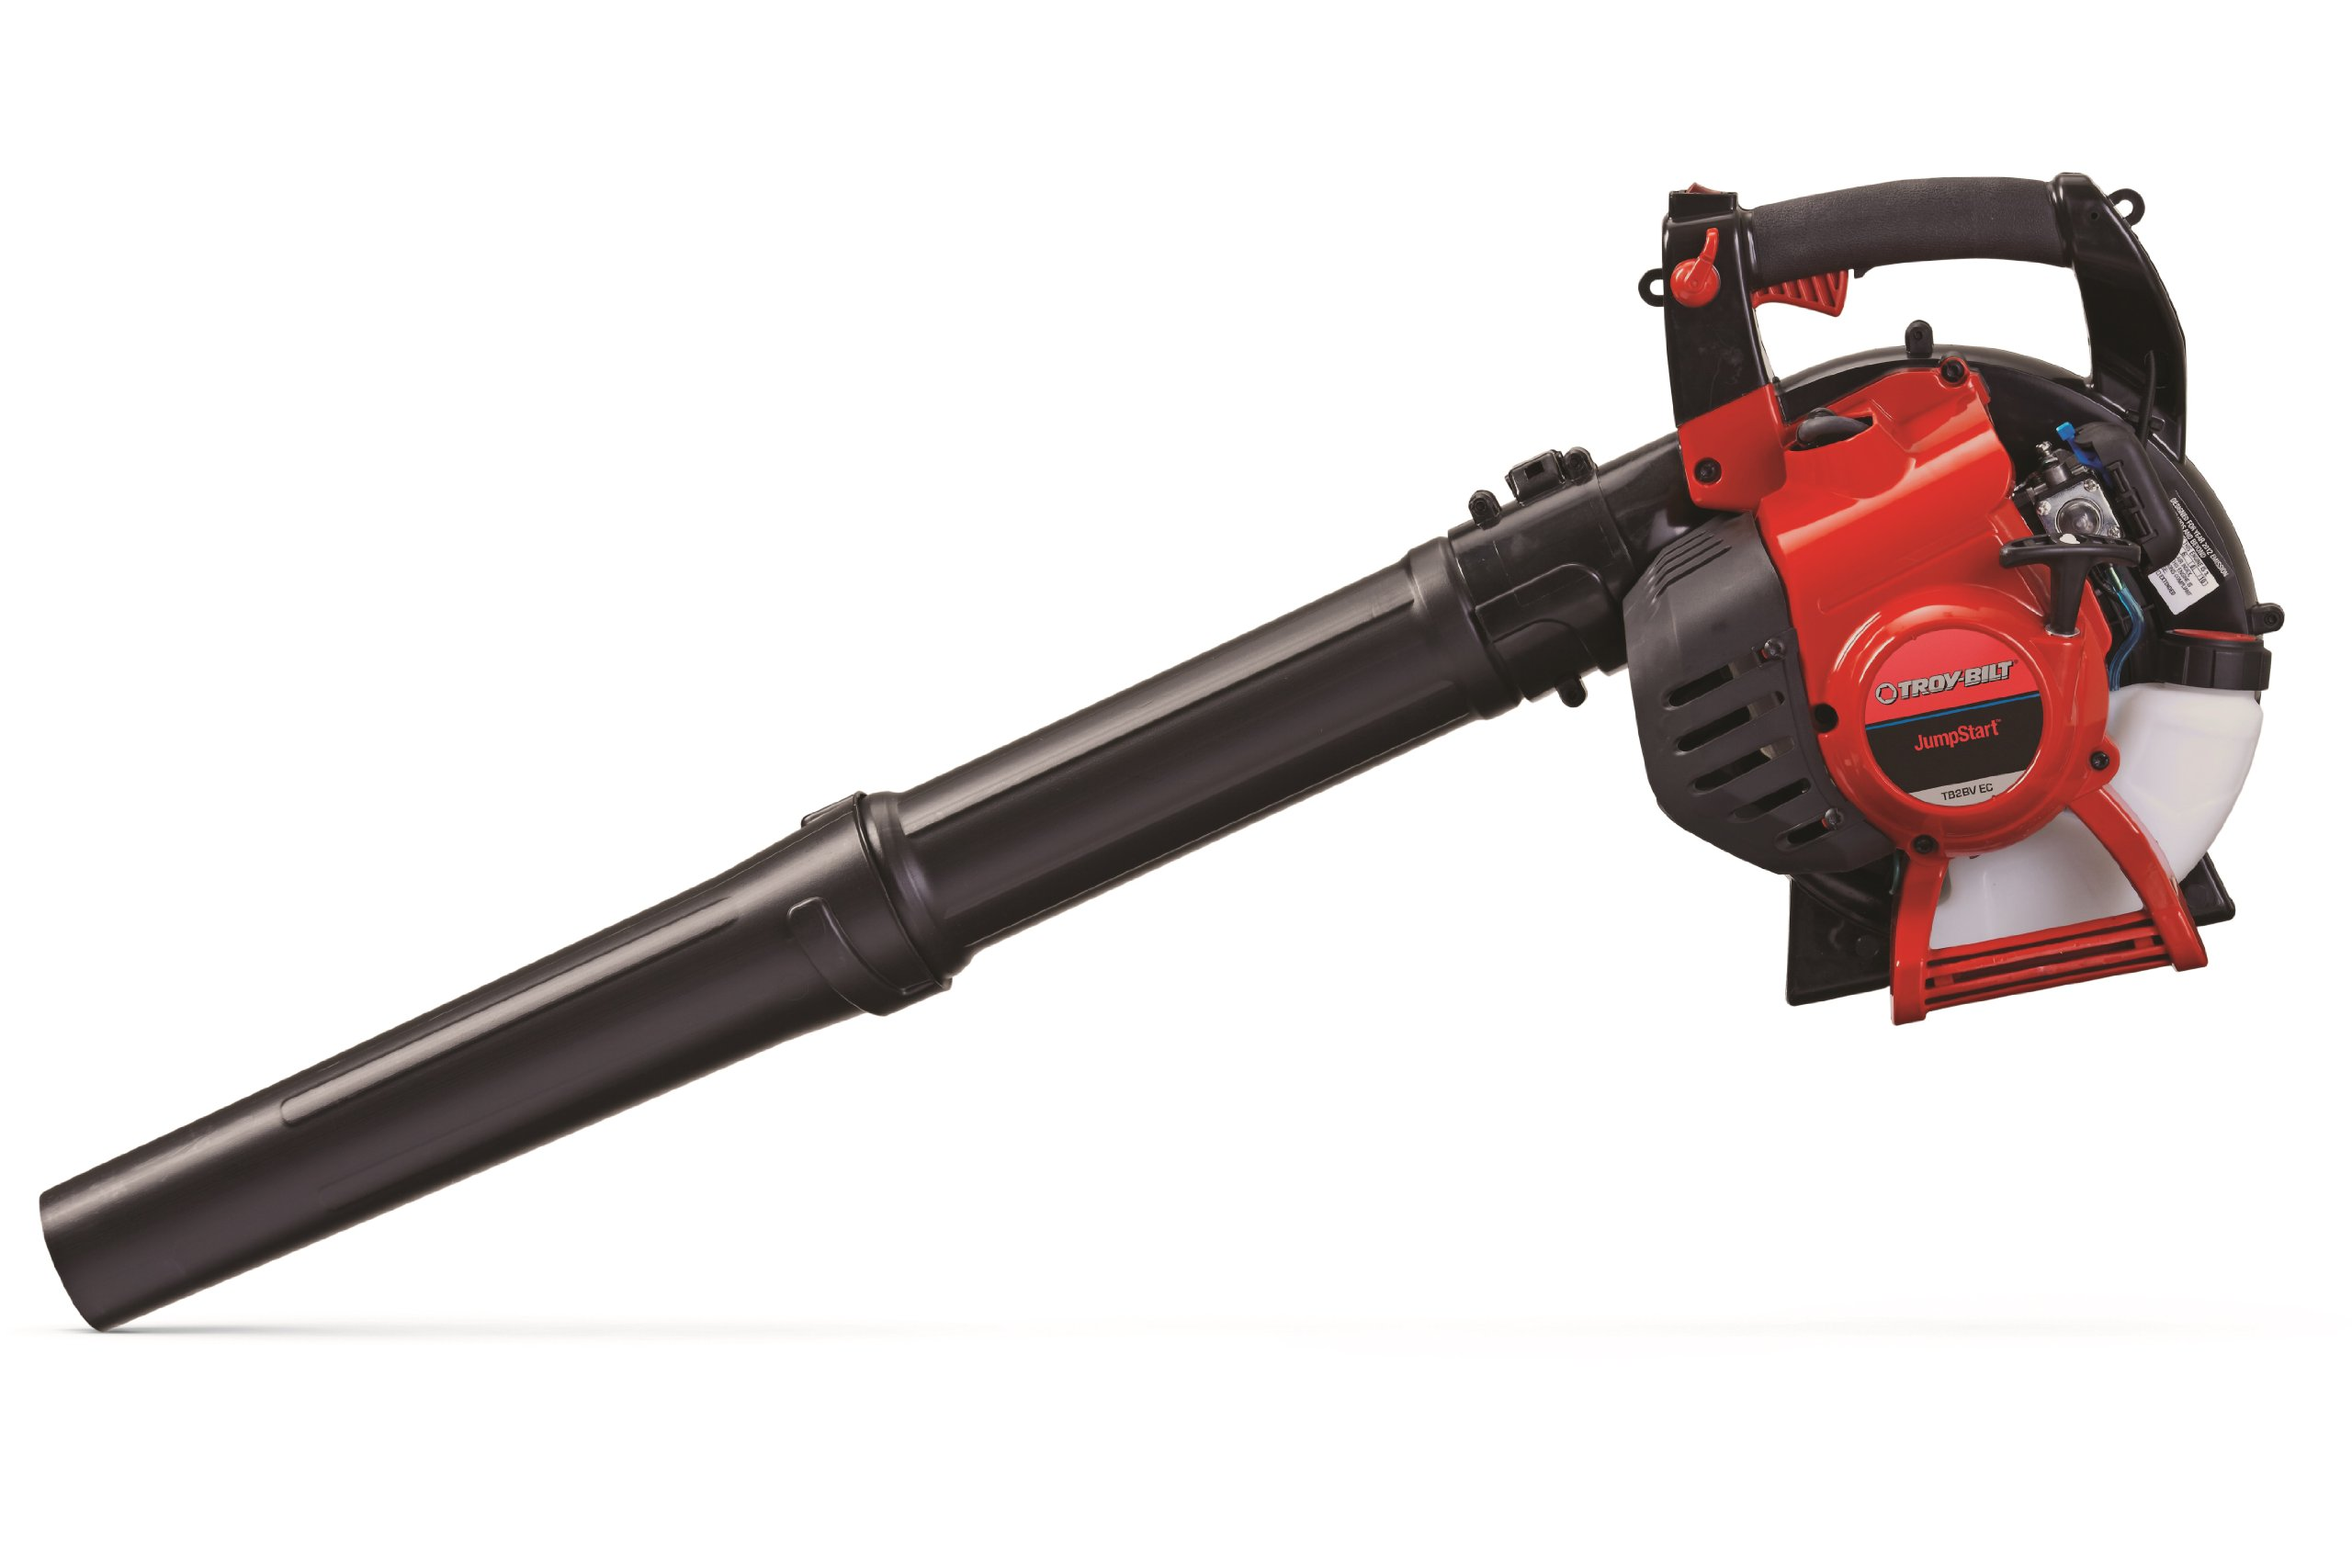 Troy-Bilt TB2BV EC 27cc 2-Cycle Gas Leaf Blower/Vac with JumpStart Technology and Vacuum Accessory